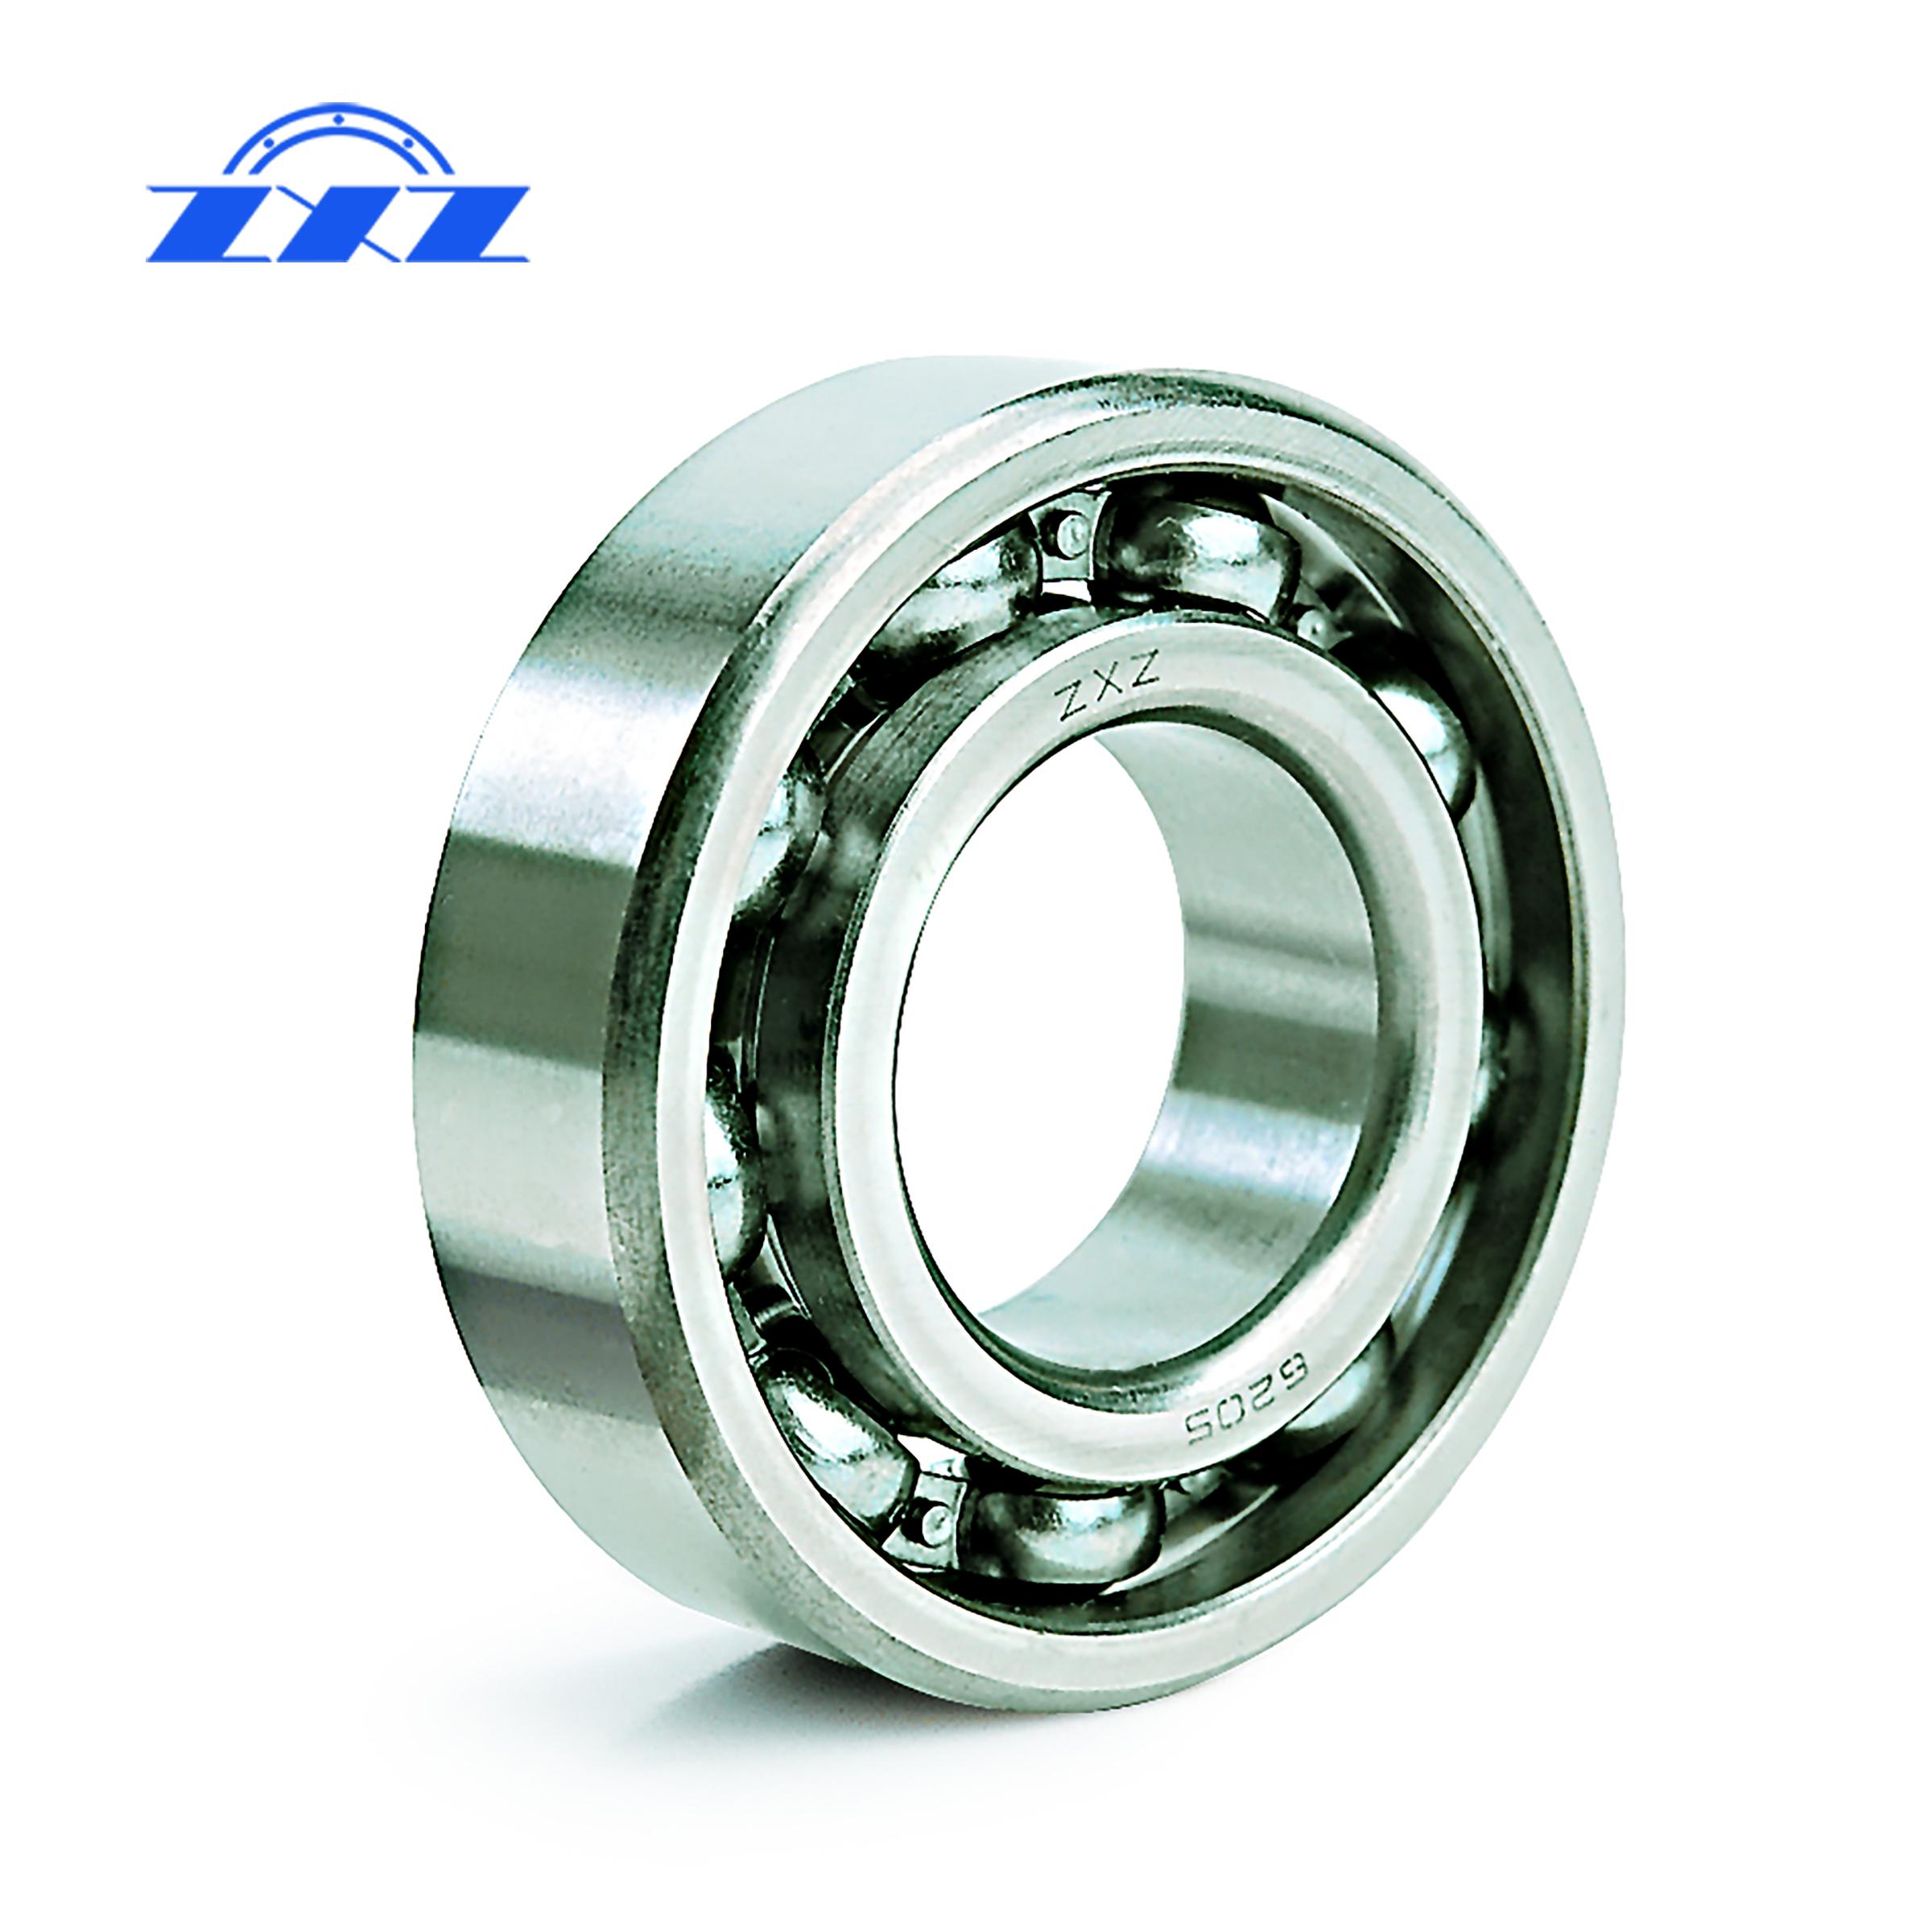 6200 deep ball bearings